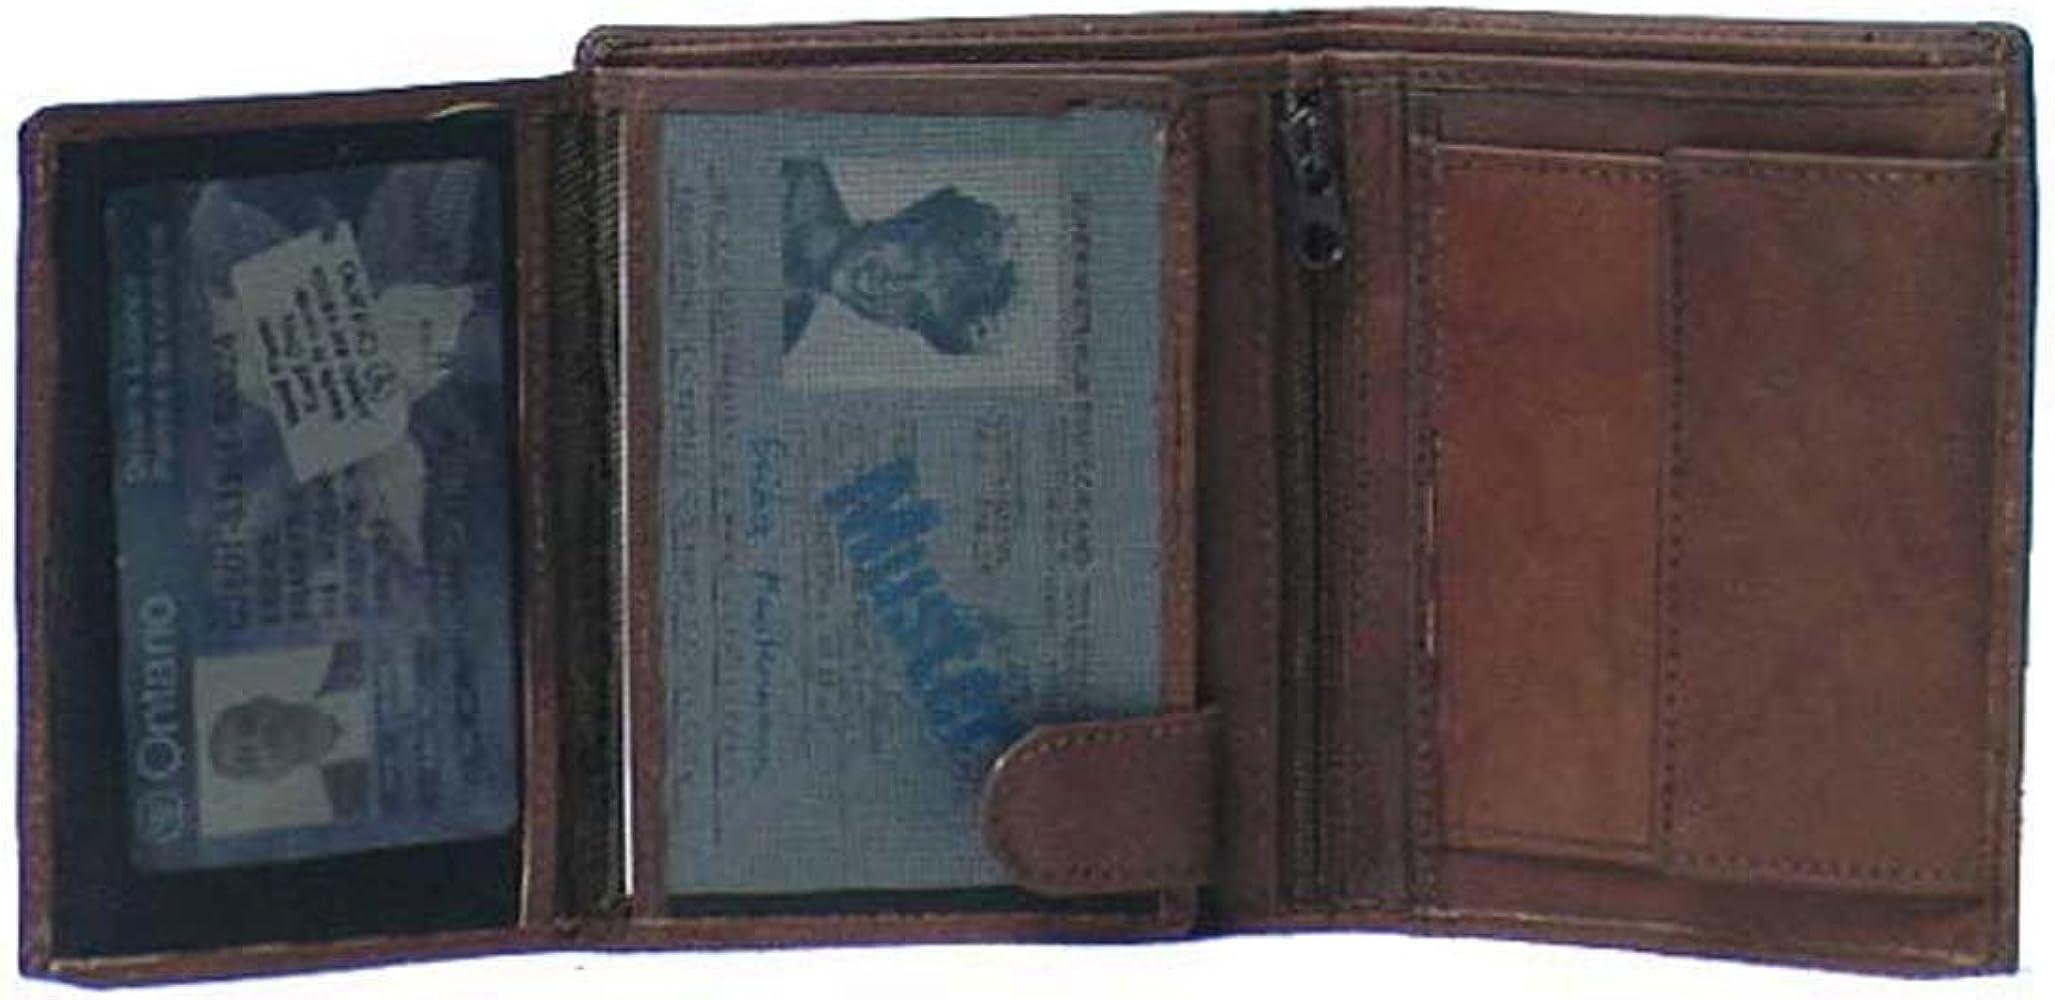 Genuine Cowhide Leather Men/'s European Large RFID Wallet #4565R CAN